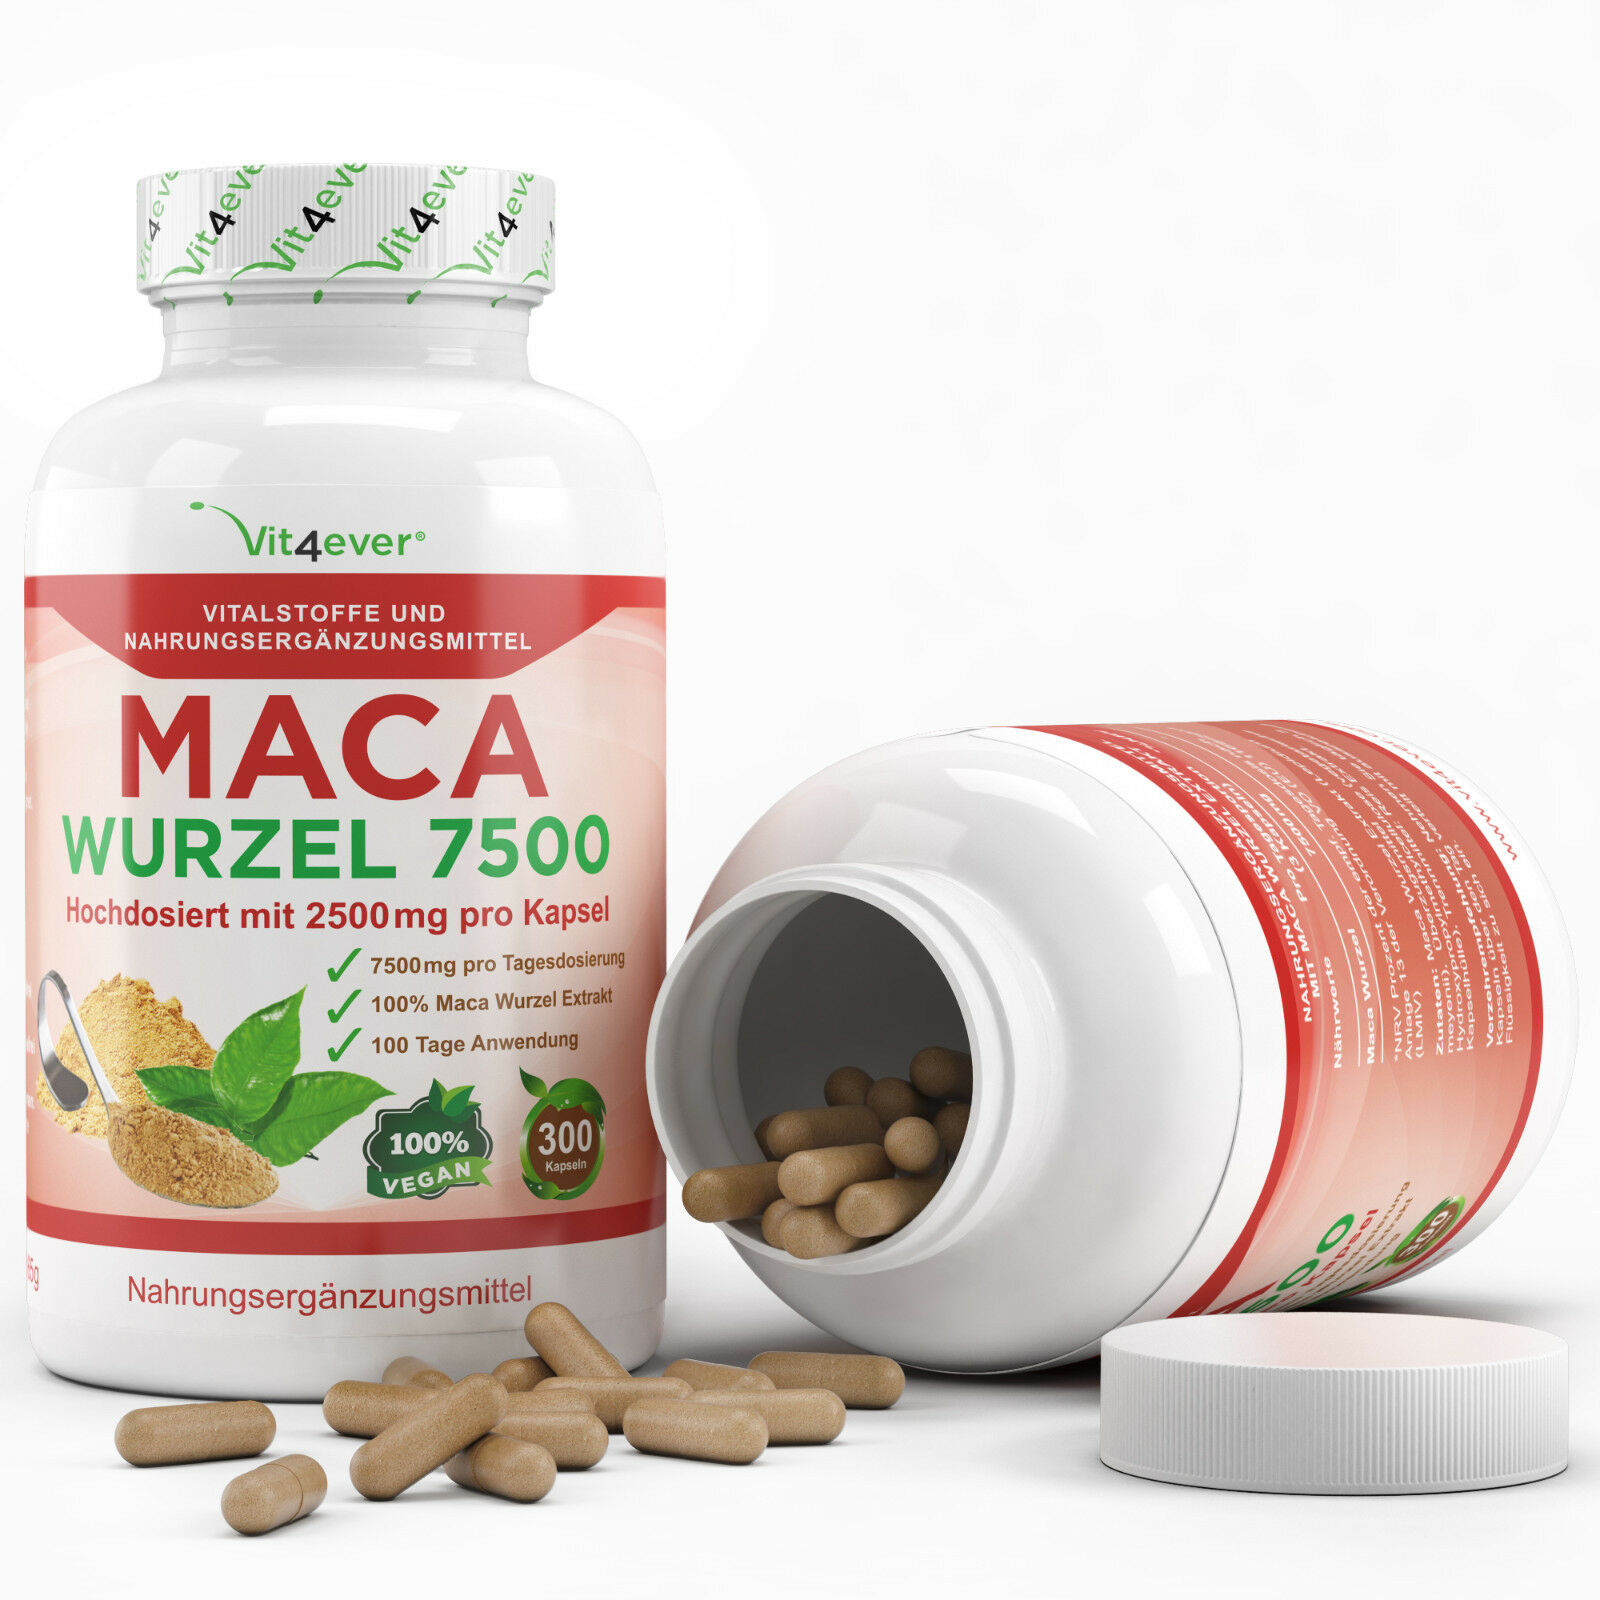 MACA 7500 300-900 Kapseln vegan - Hochdosiert - Muskelaufbau Potenz Laborgeprüft